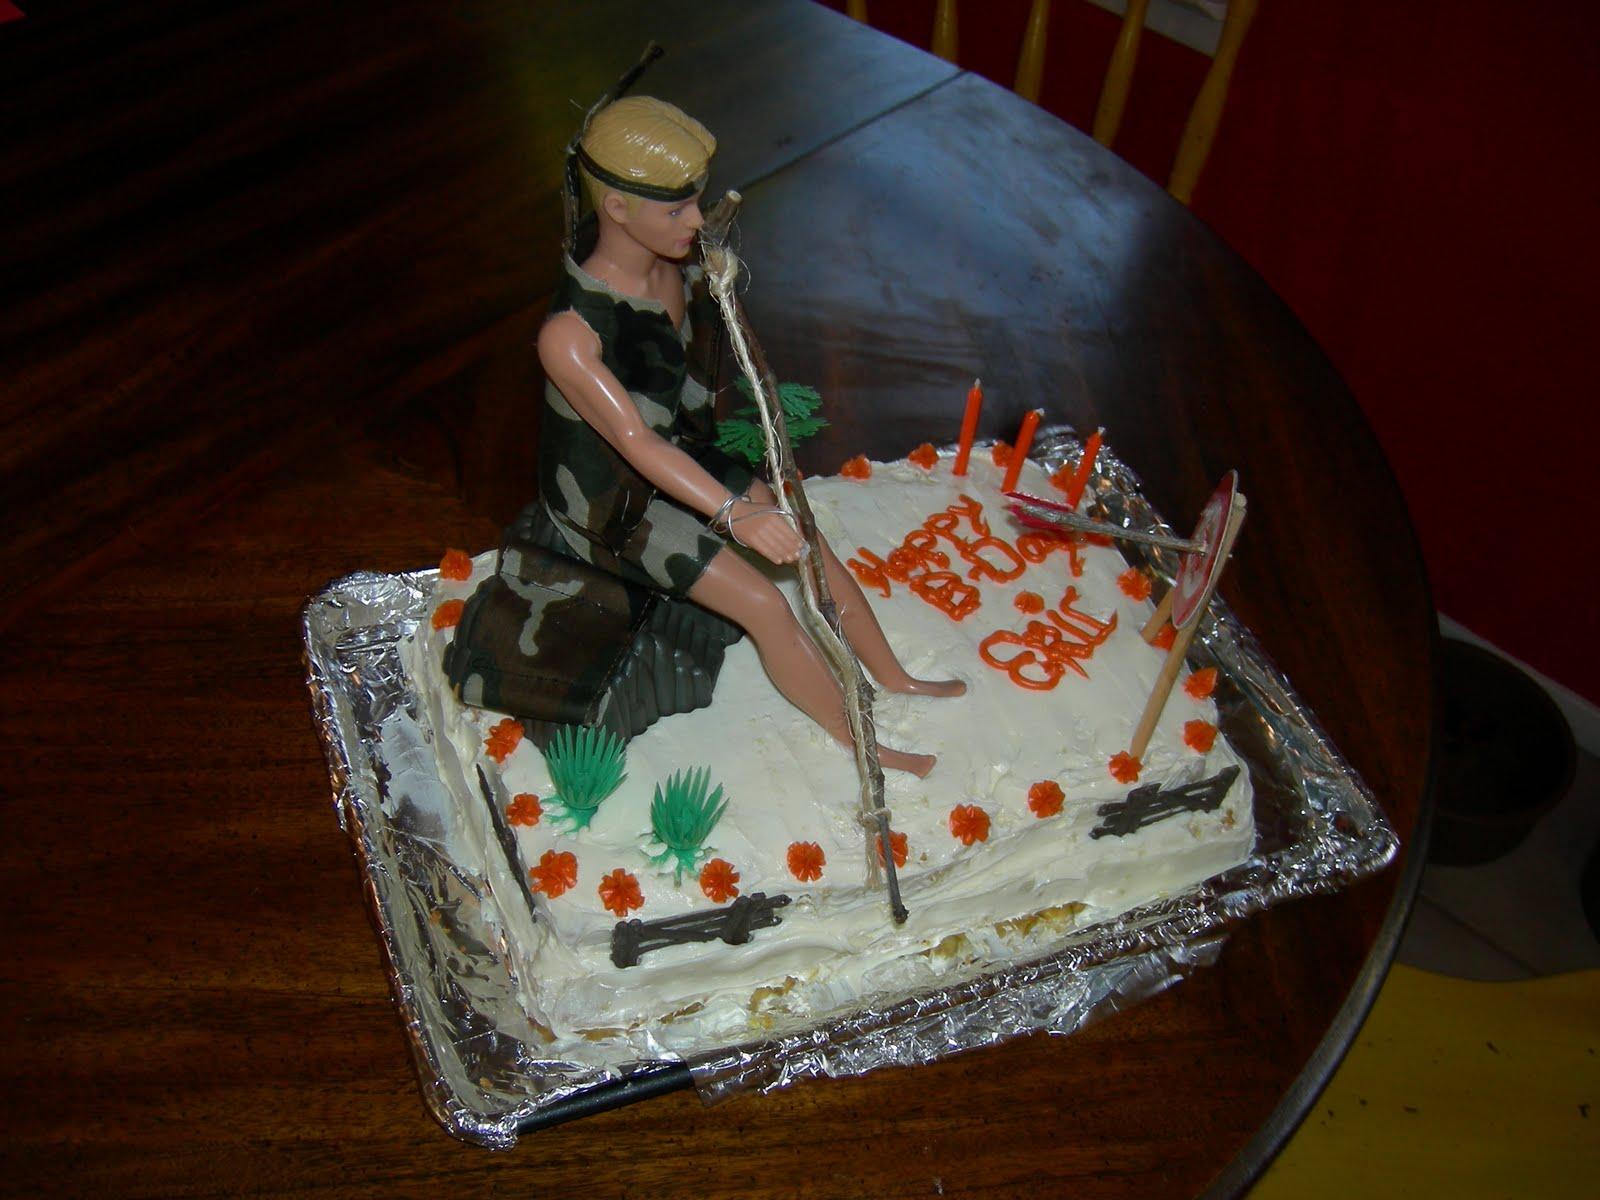 Beef Caker Bow Hunting Ken Barbie Cake